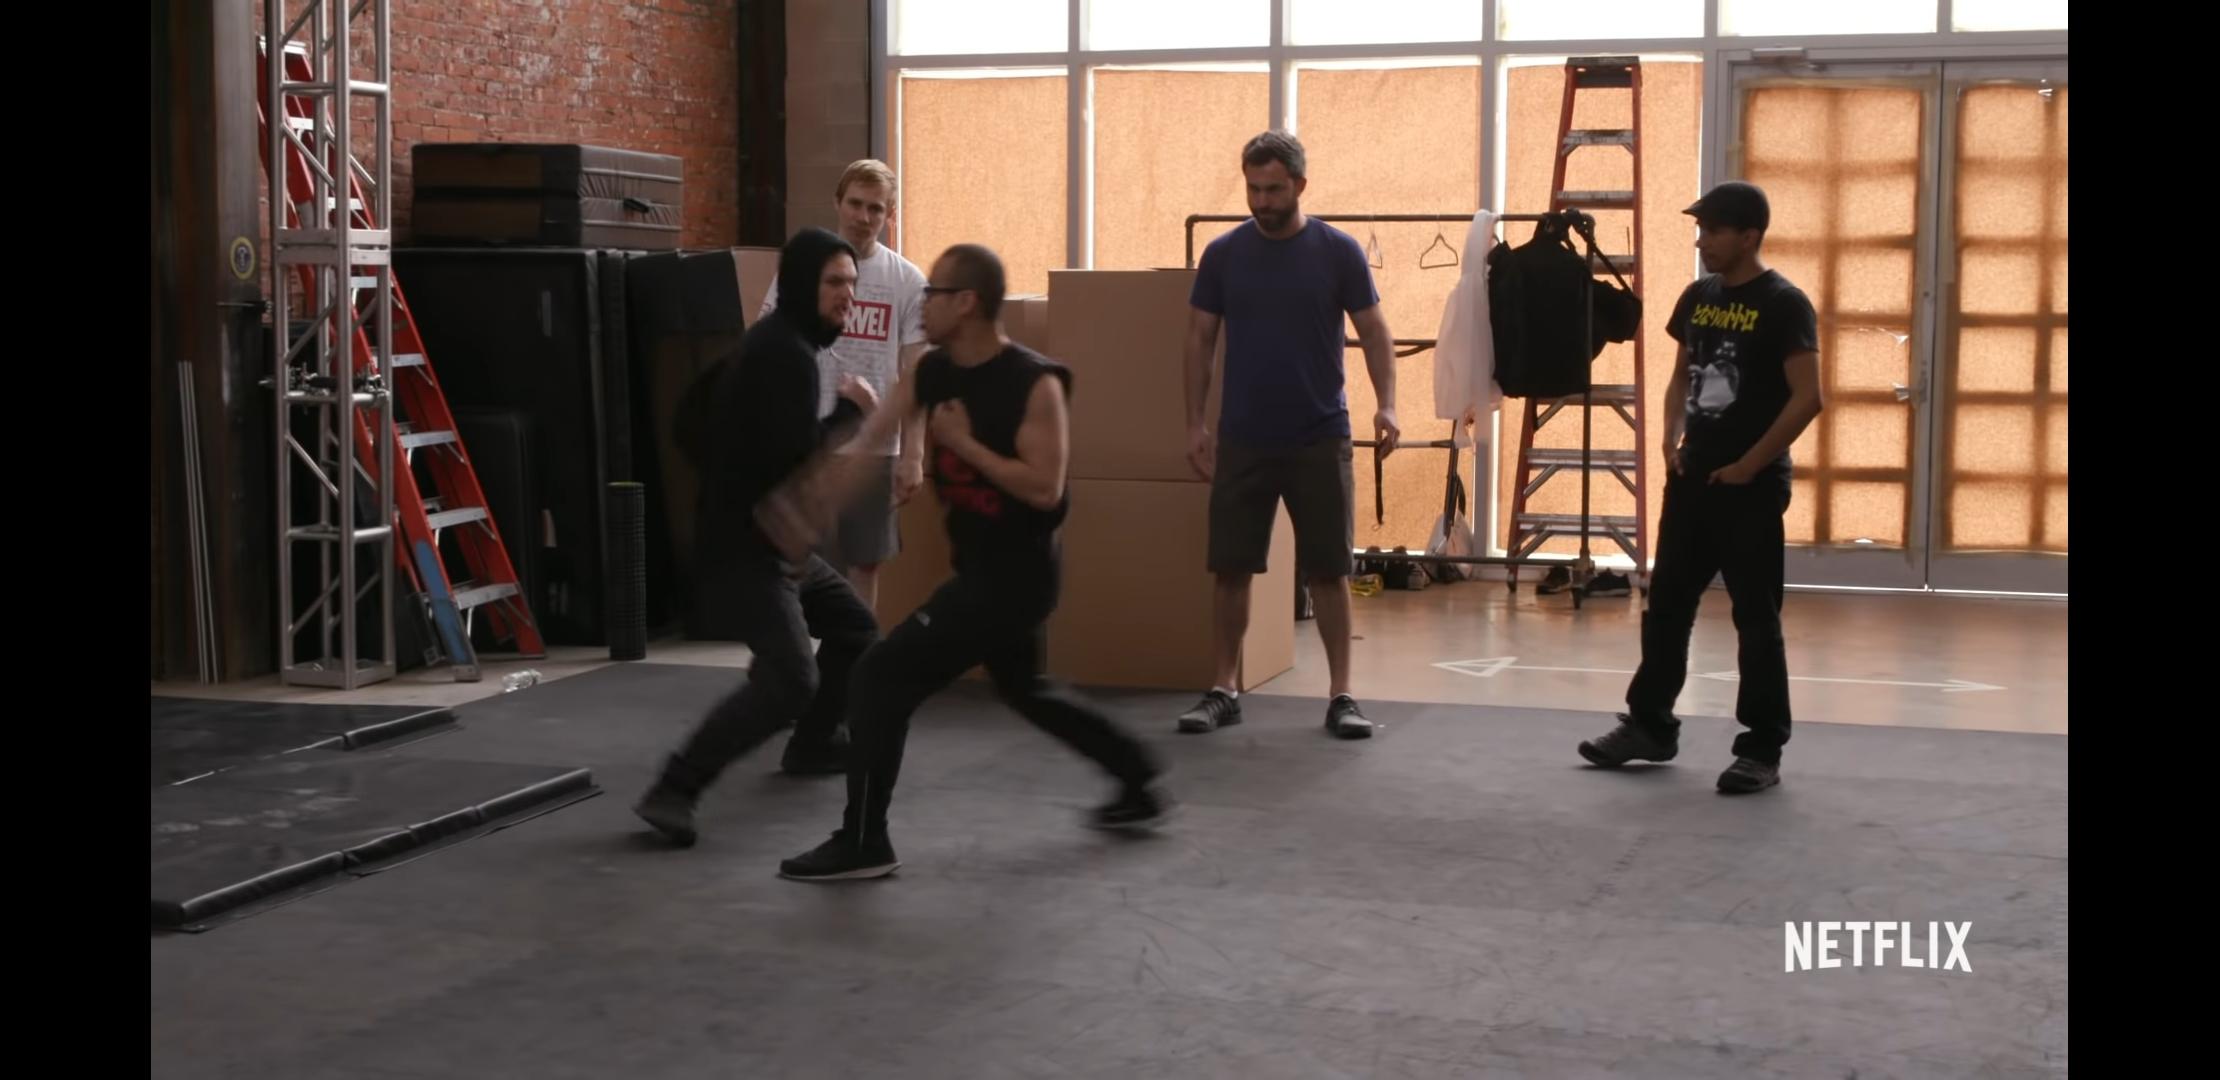 Malay Kim, Airon Armstrong, Emmanuel Manzanares, Finn Jones, and David Armstrong in Iron Fist (2017)